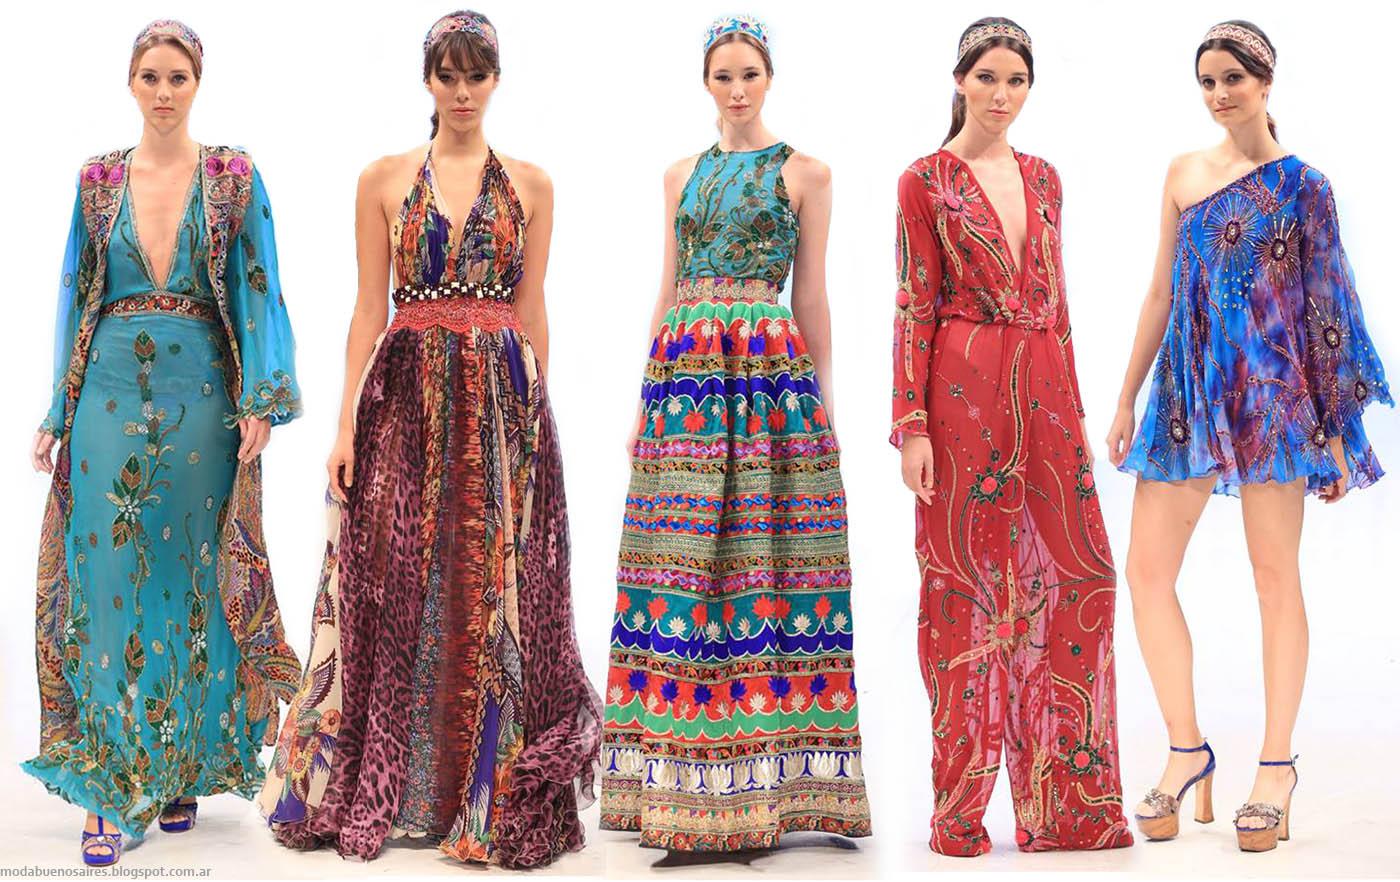 Moda otono invierno 2015 argentina vestidos